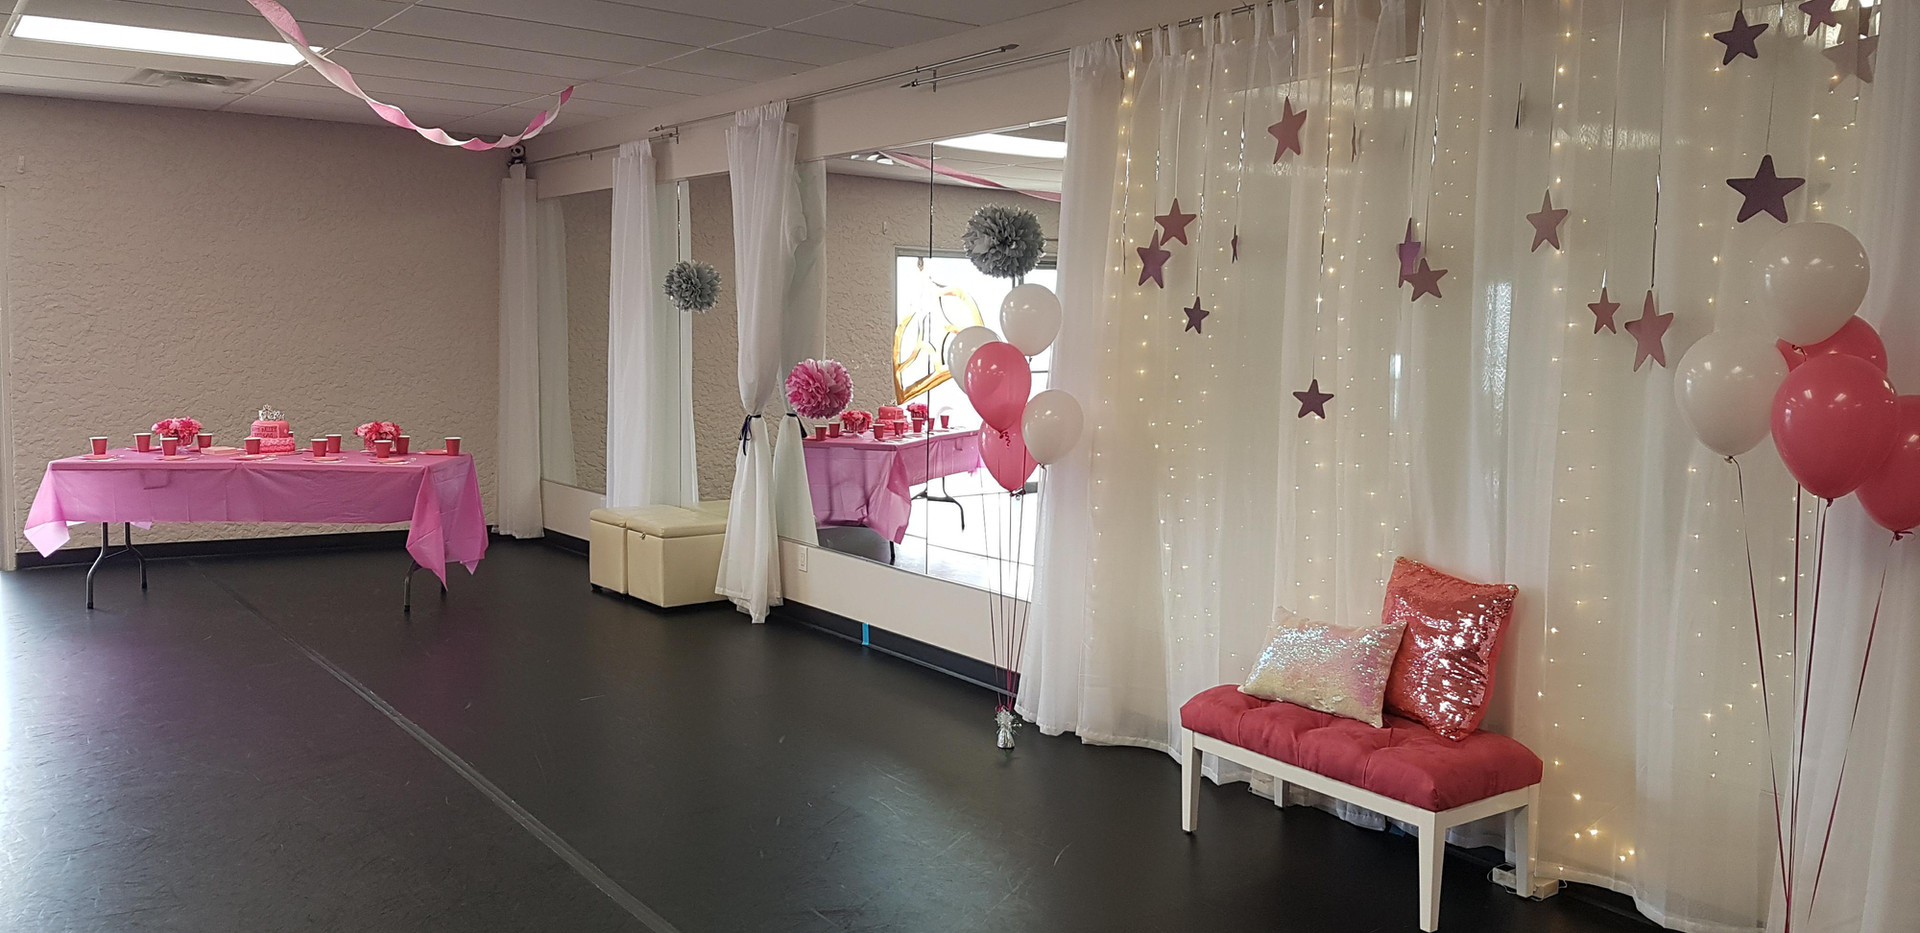 Princess Ballet Studio View 2